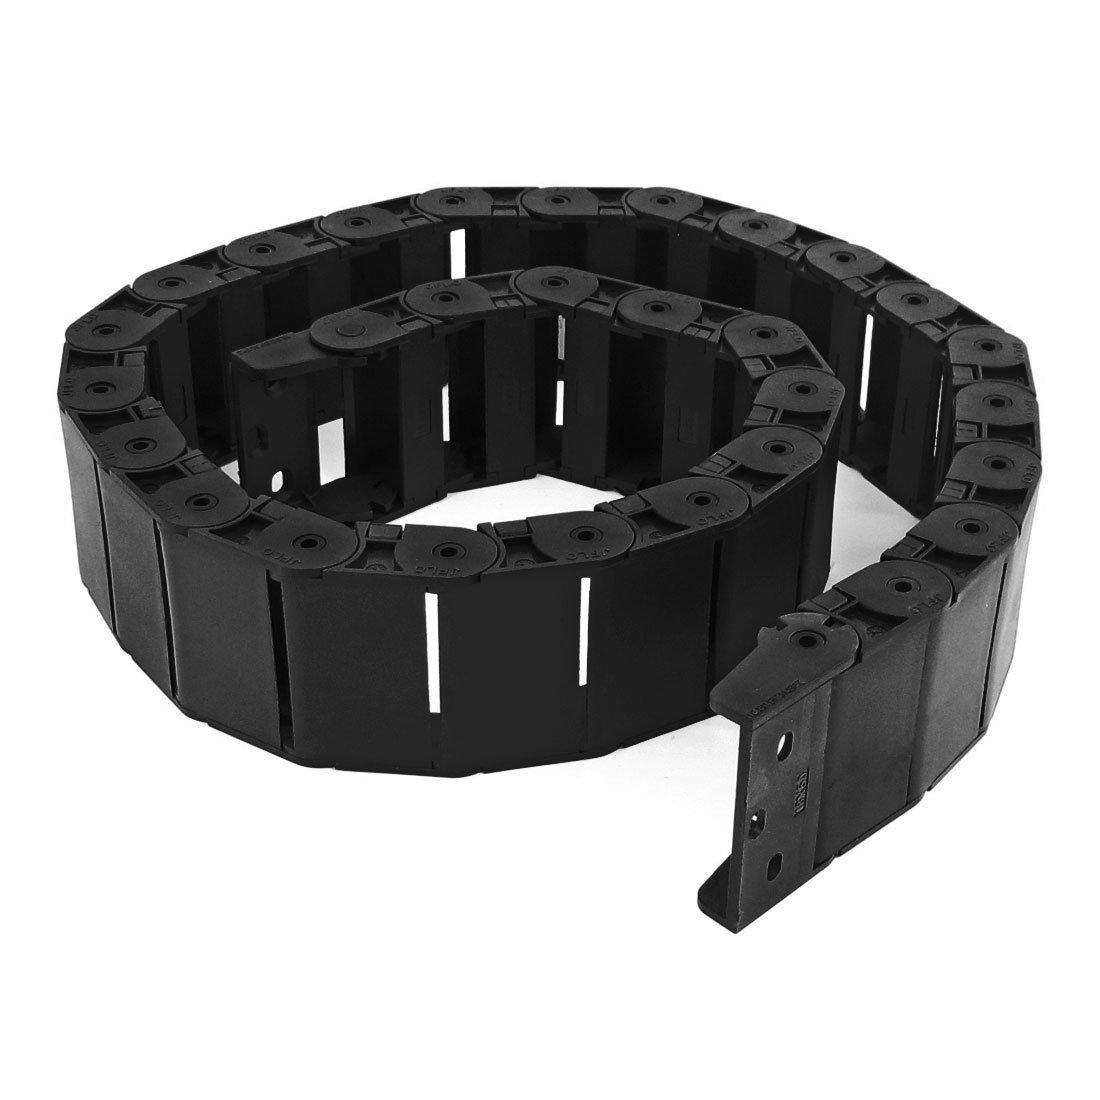 R Kabelschleppkette SODIAL 40.55 schwarz Kabel Draht Traeger Schleppkette Verschachtelte 18x50mm